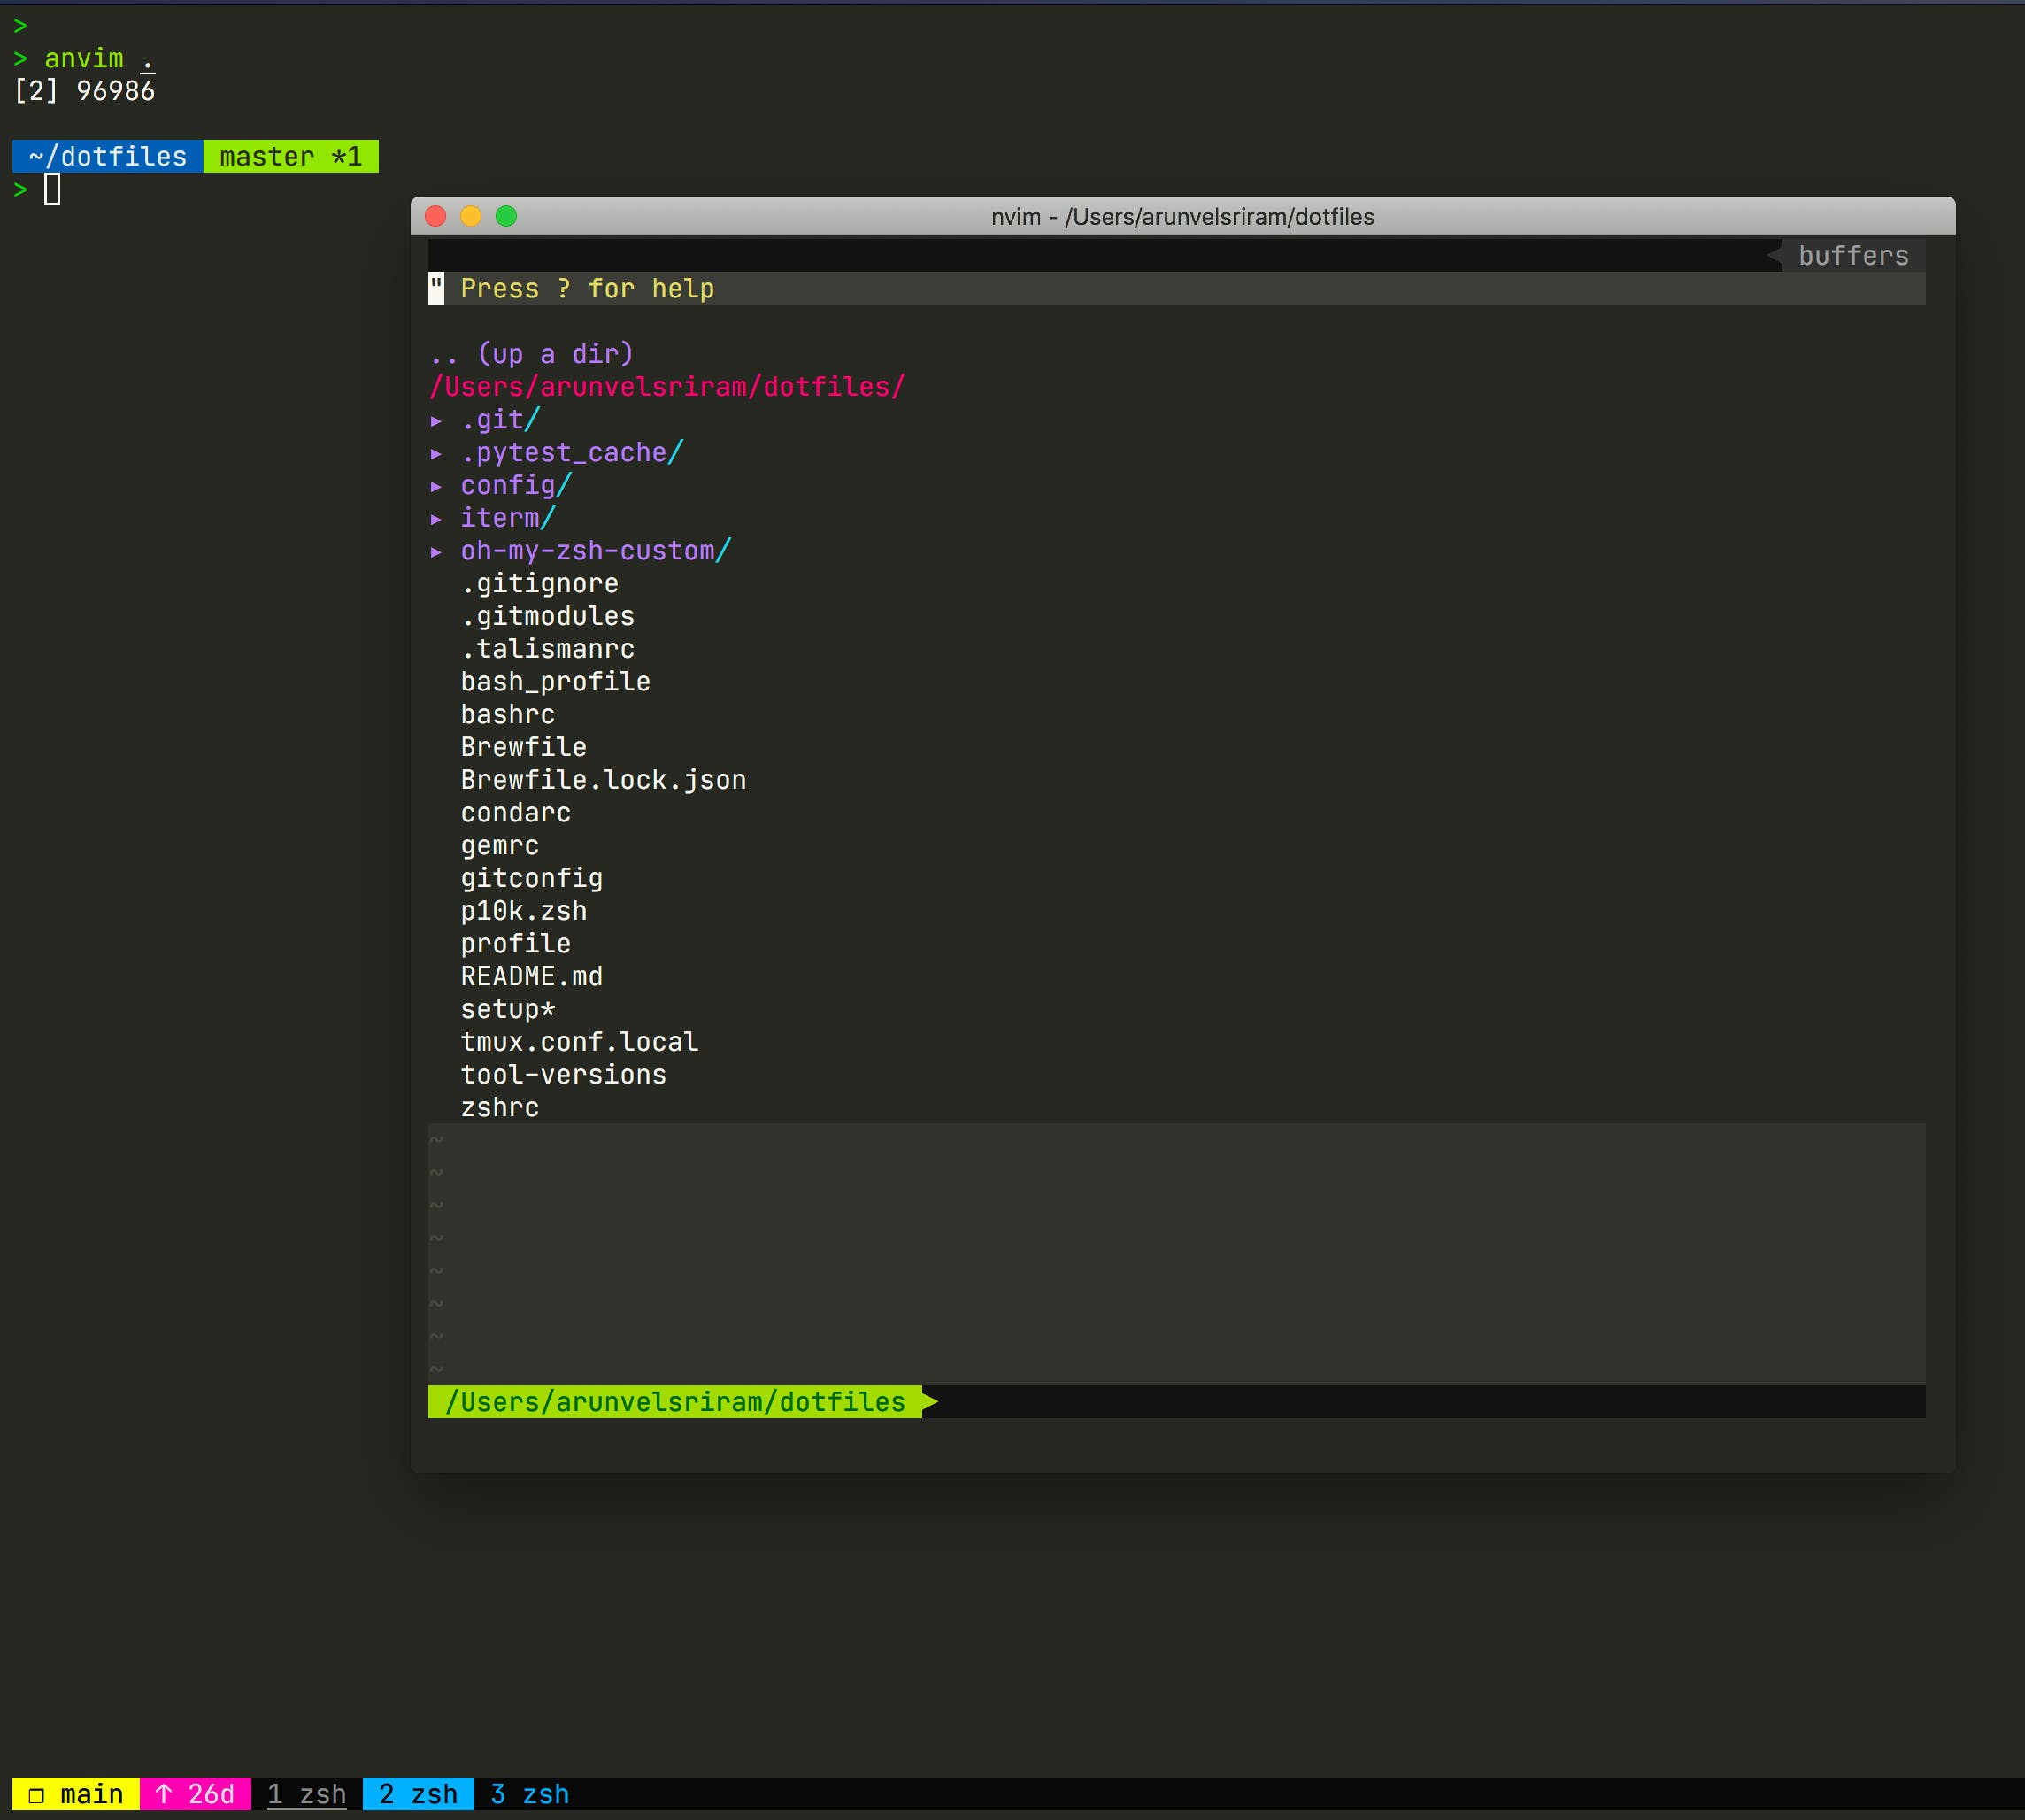 Screenshot 2020-10-17 at 11.29.51 PM.png